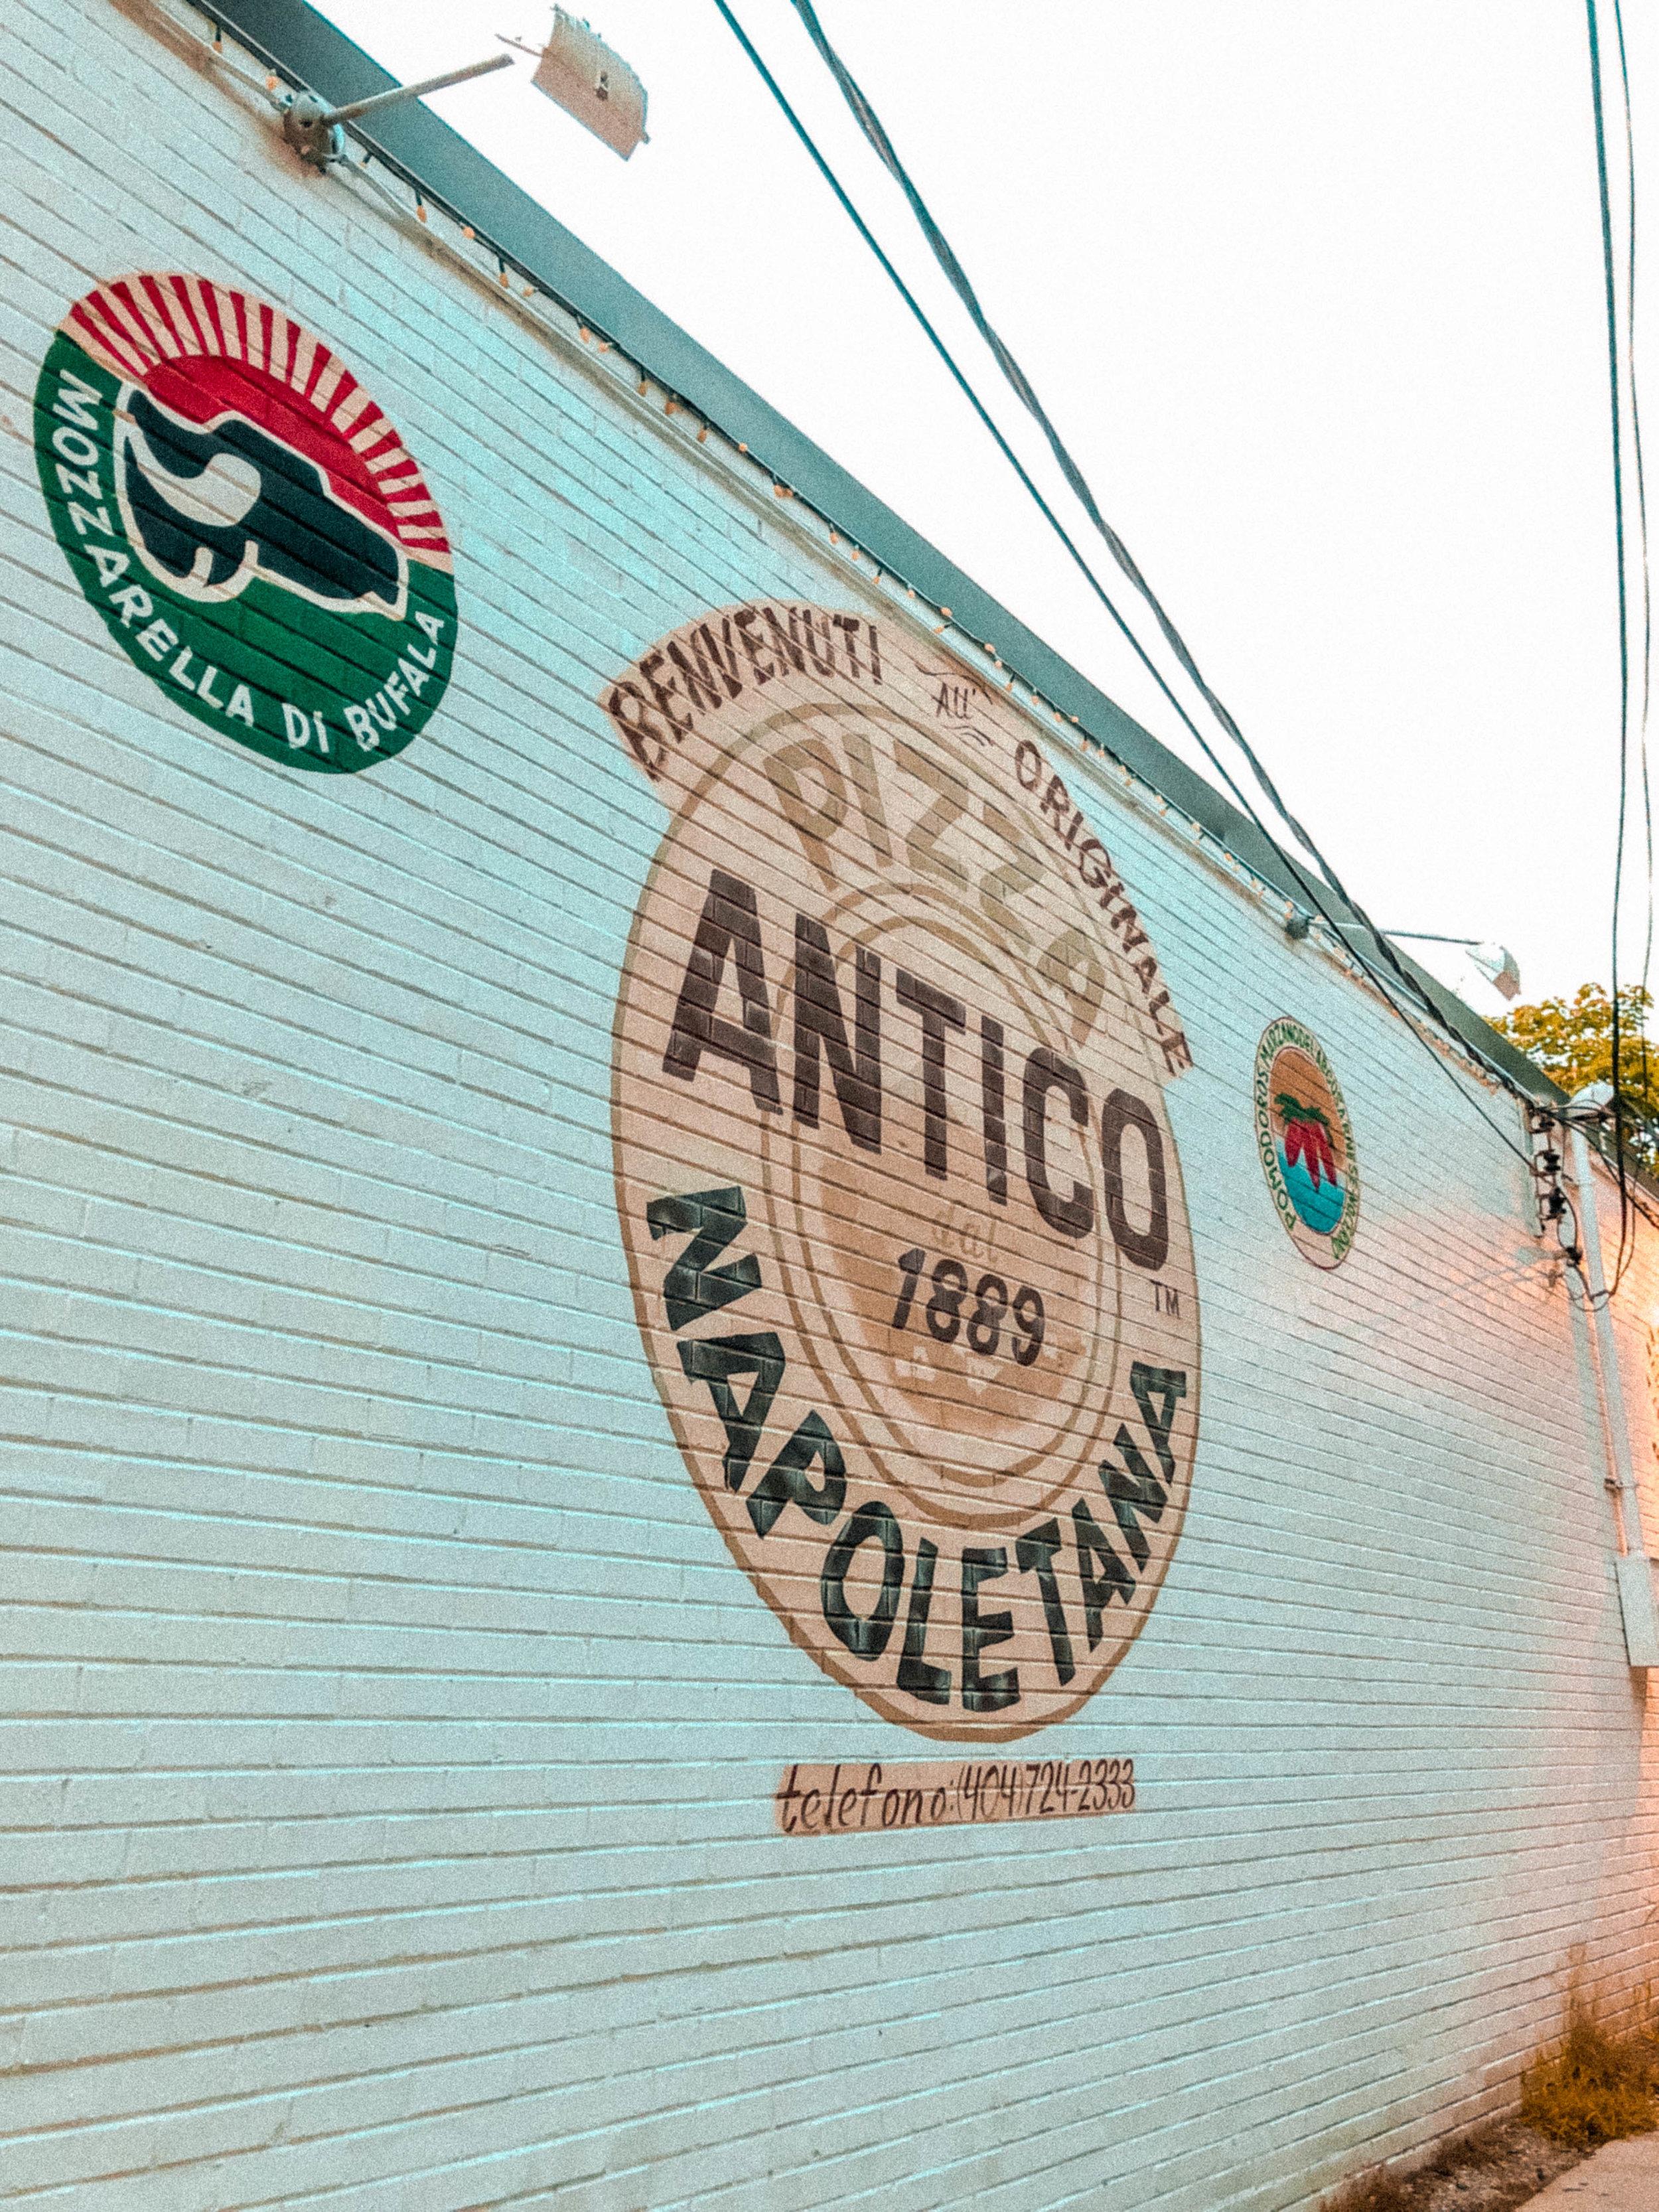 Antico Pizza | Things to Do in Atlanta | Jordan Hefler